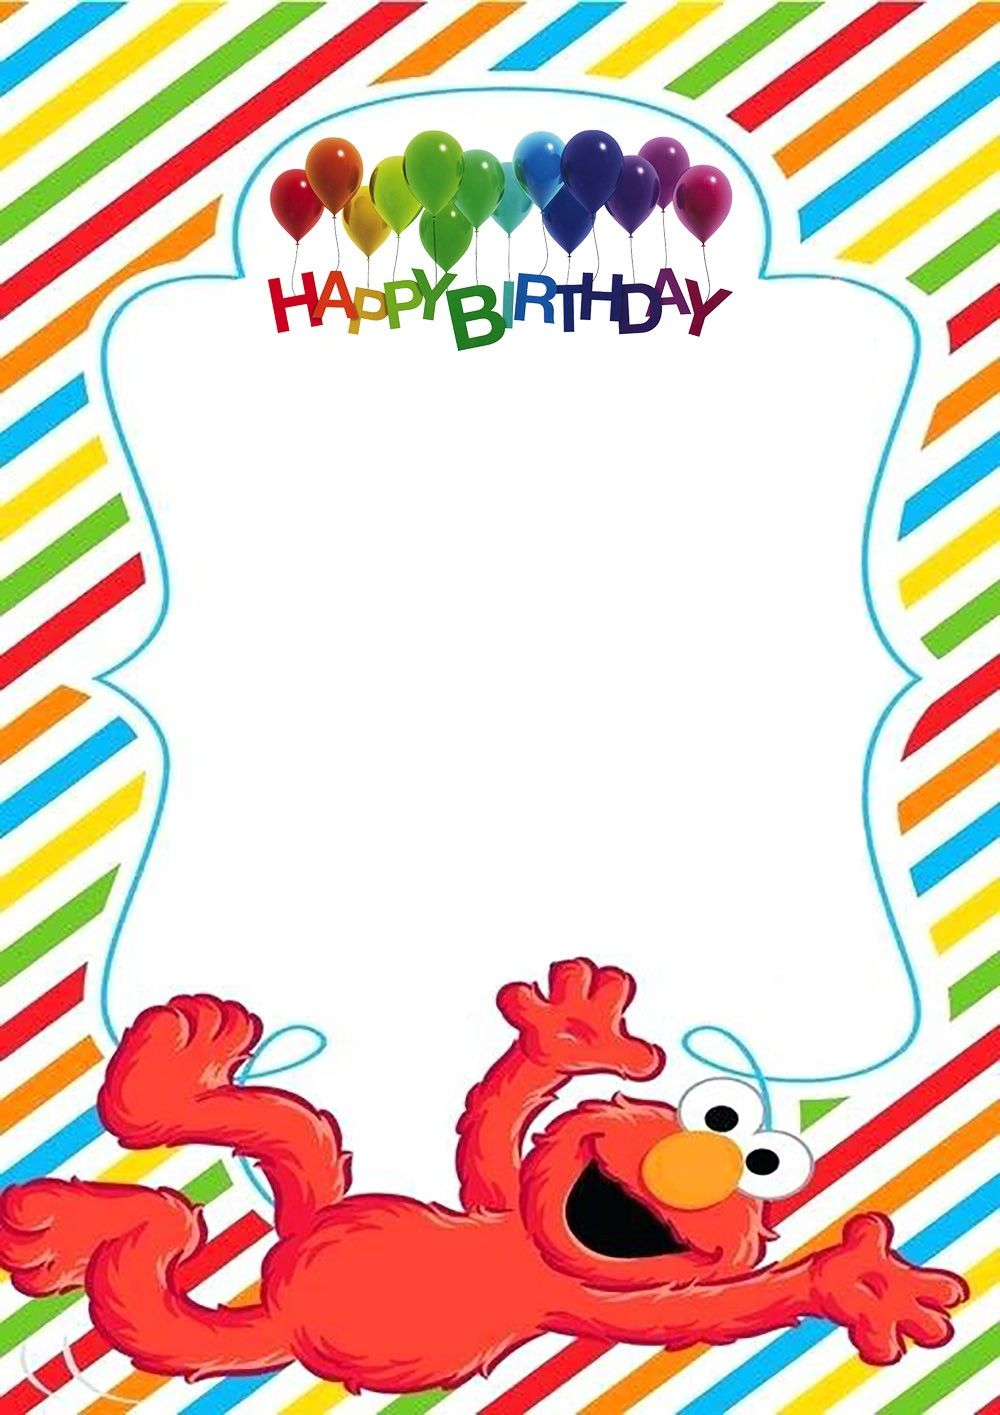 Elmo Birthday Party Invitation Template Elmo Invitations Elmo Birthday Invitations Elmo Birthday Party